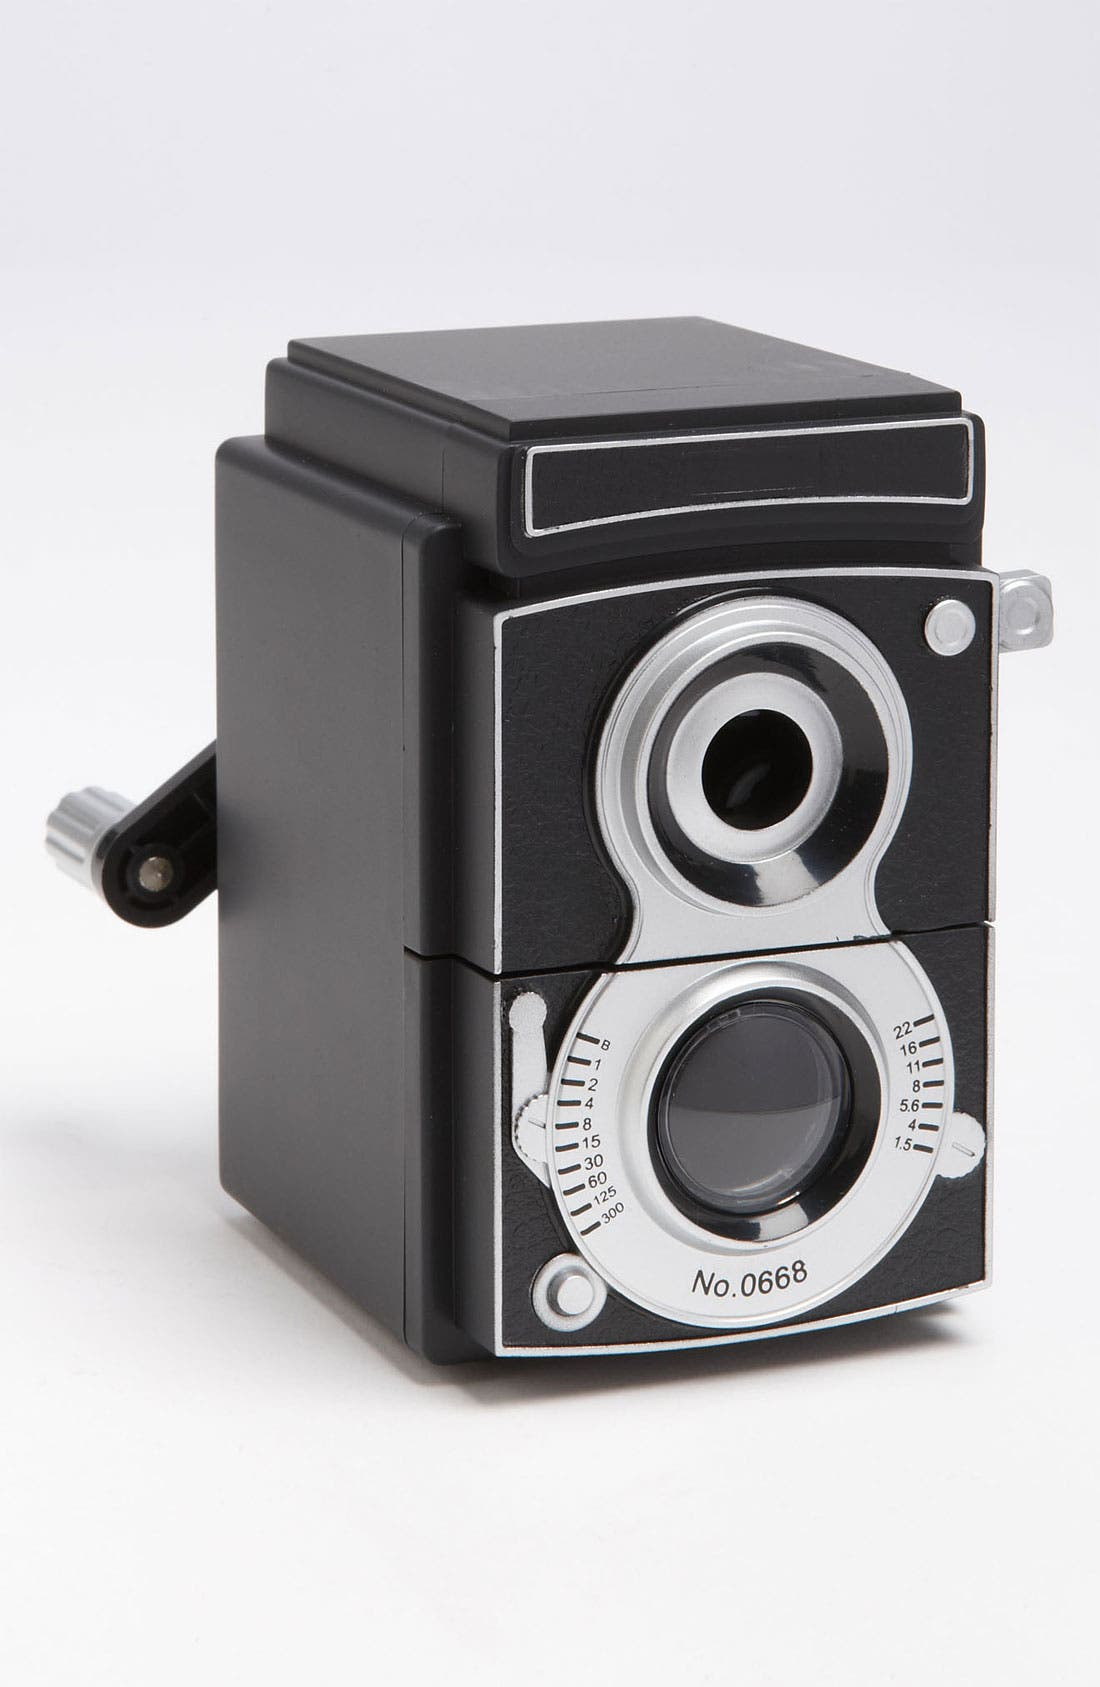 Main Image - Kikkerland Design Camera Pencil Sharpener